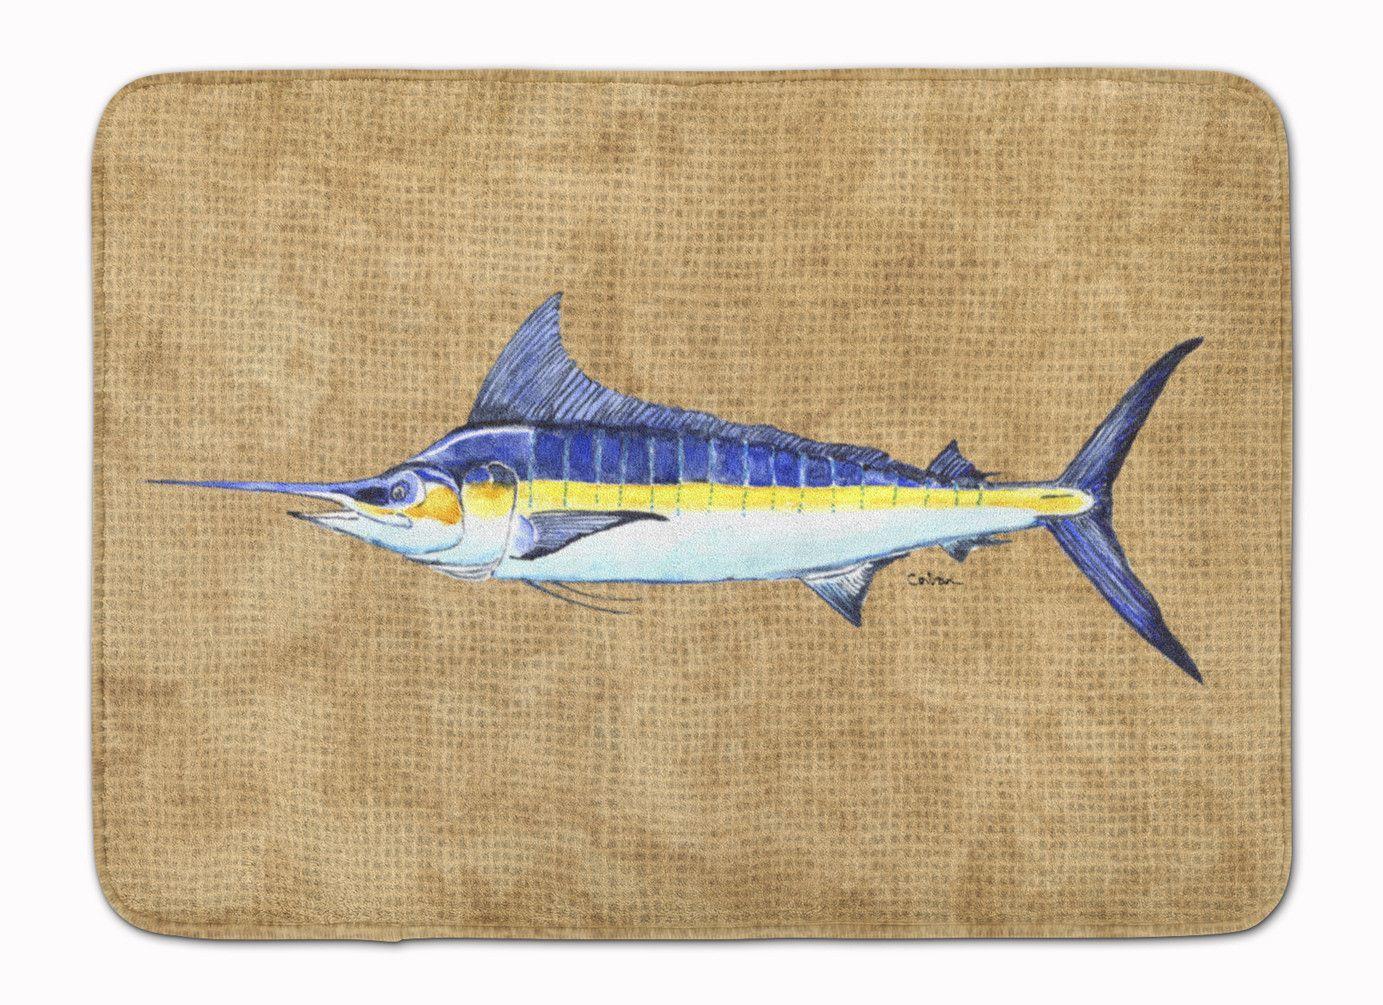 Wonderful Marlin Wall Decor Contemporary - Wall Art Ideas - dochista ...